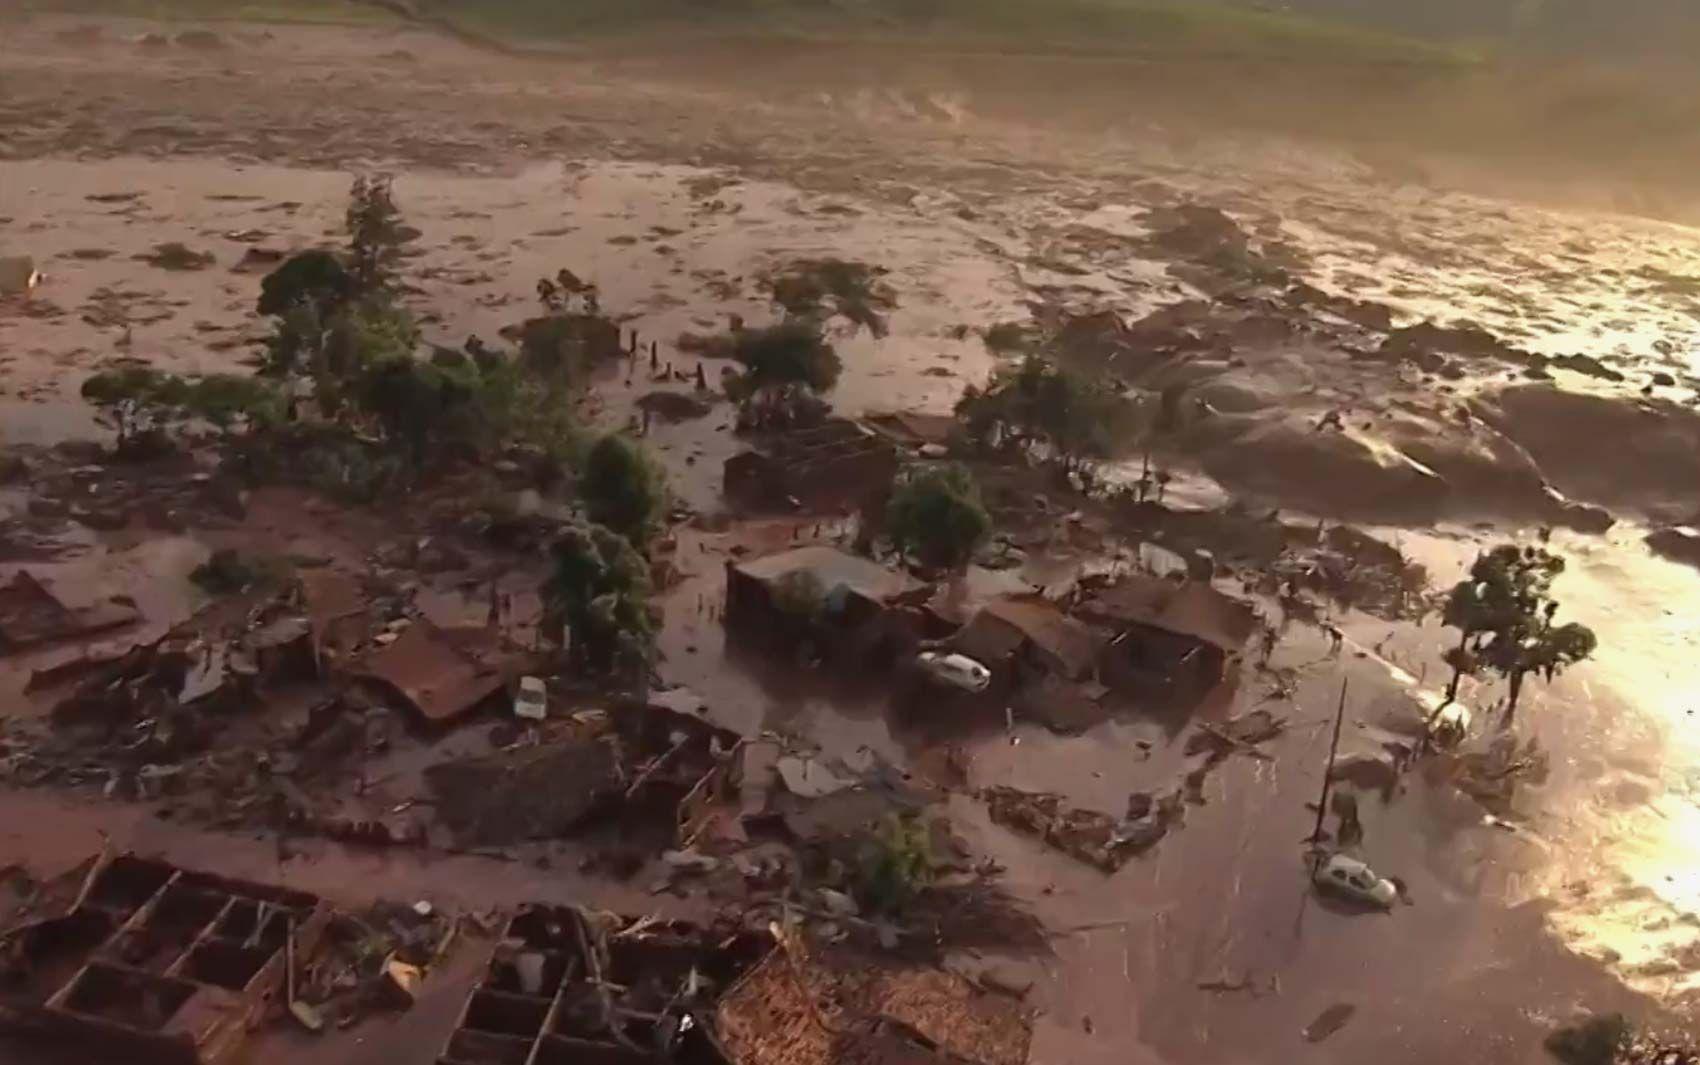 05/11 - Barragem se rompe e enxurrada de lama destrói distrito de Mariana